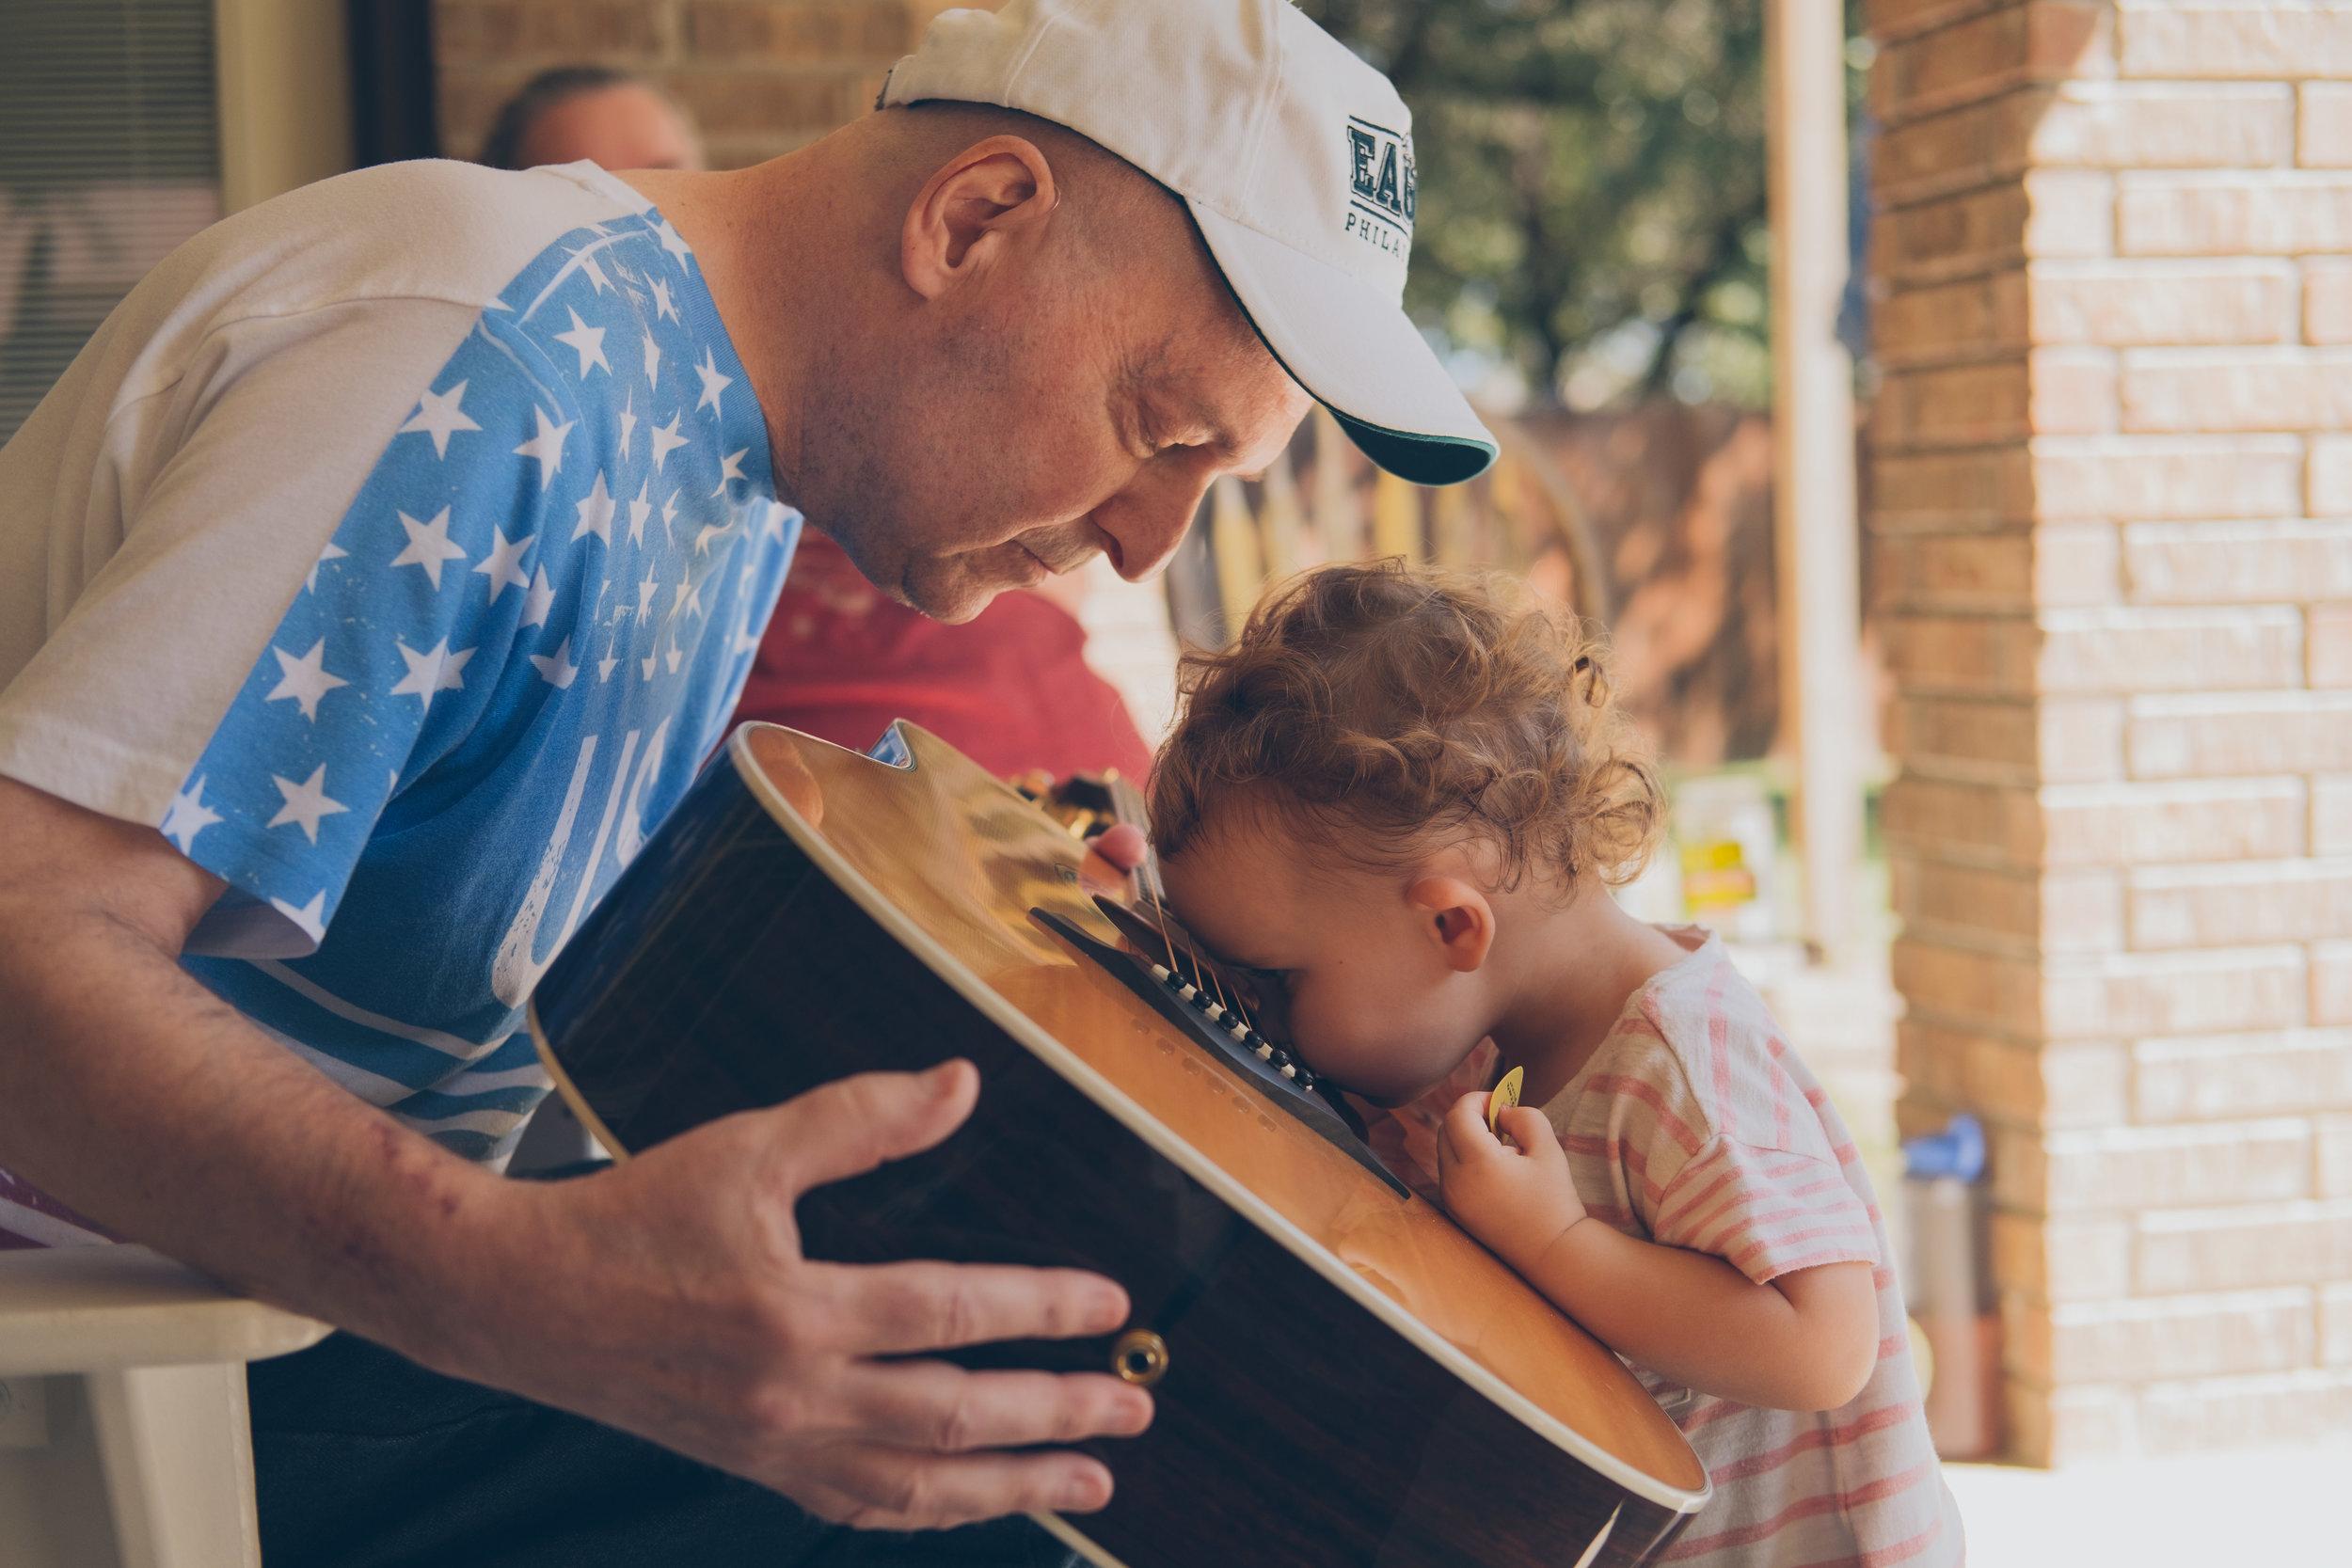 Old man and baby looking at guitar